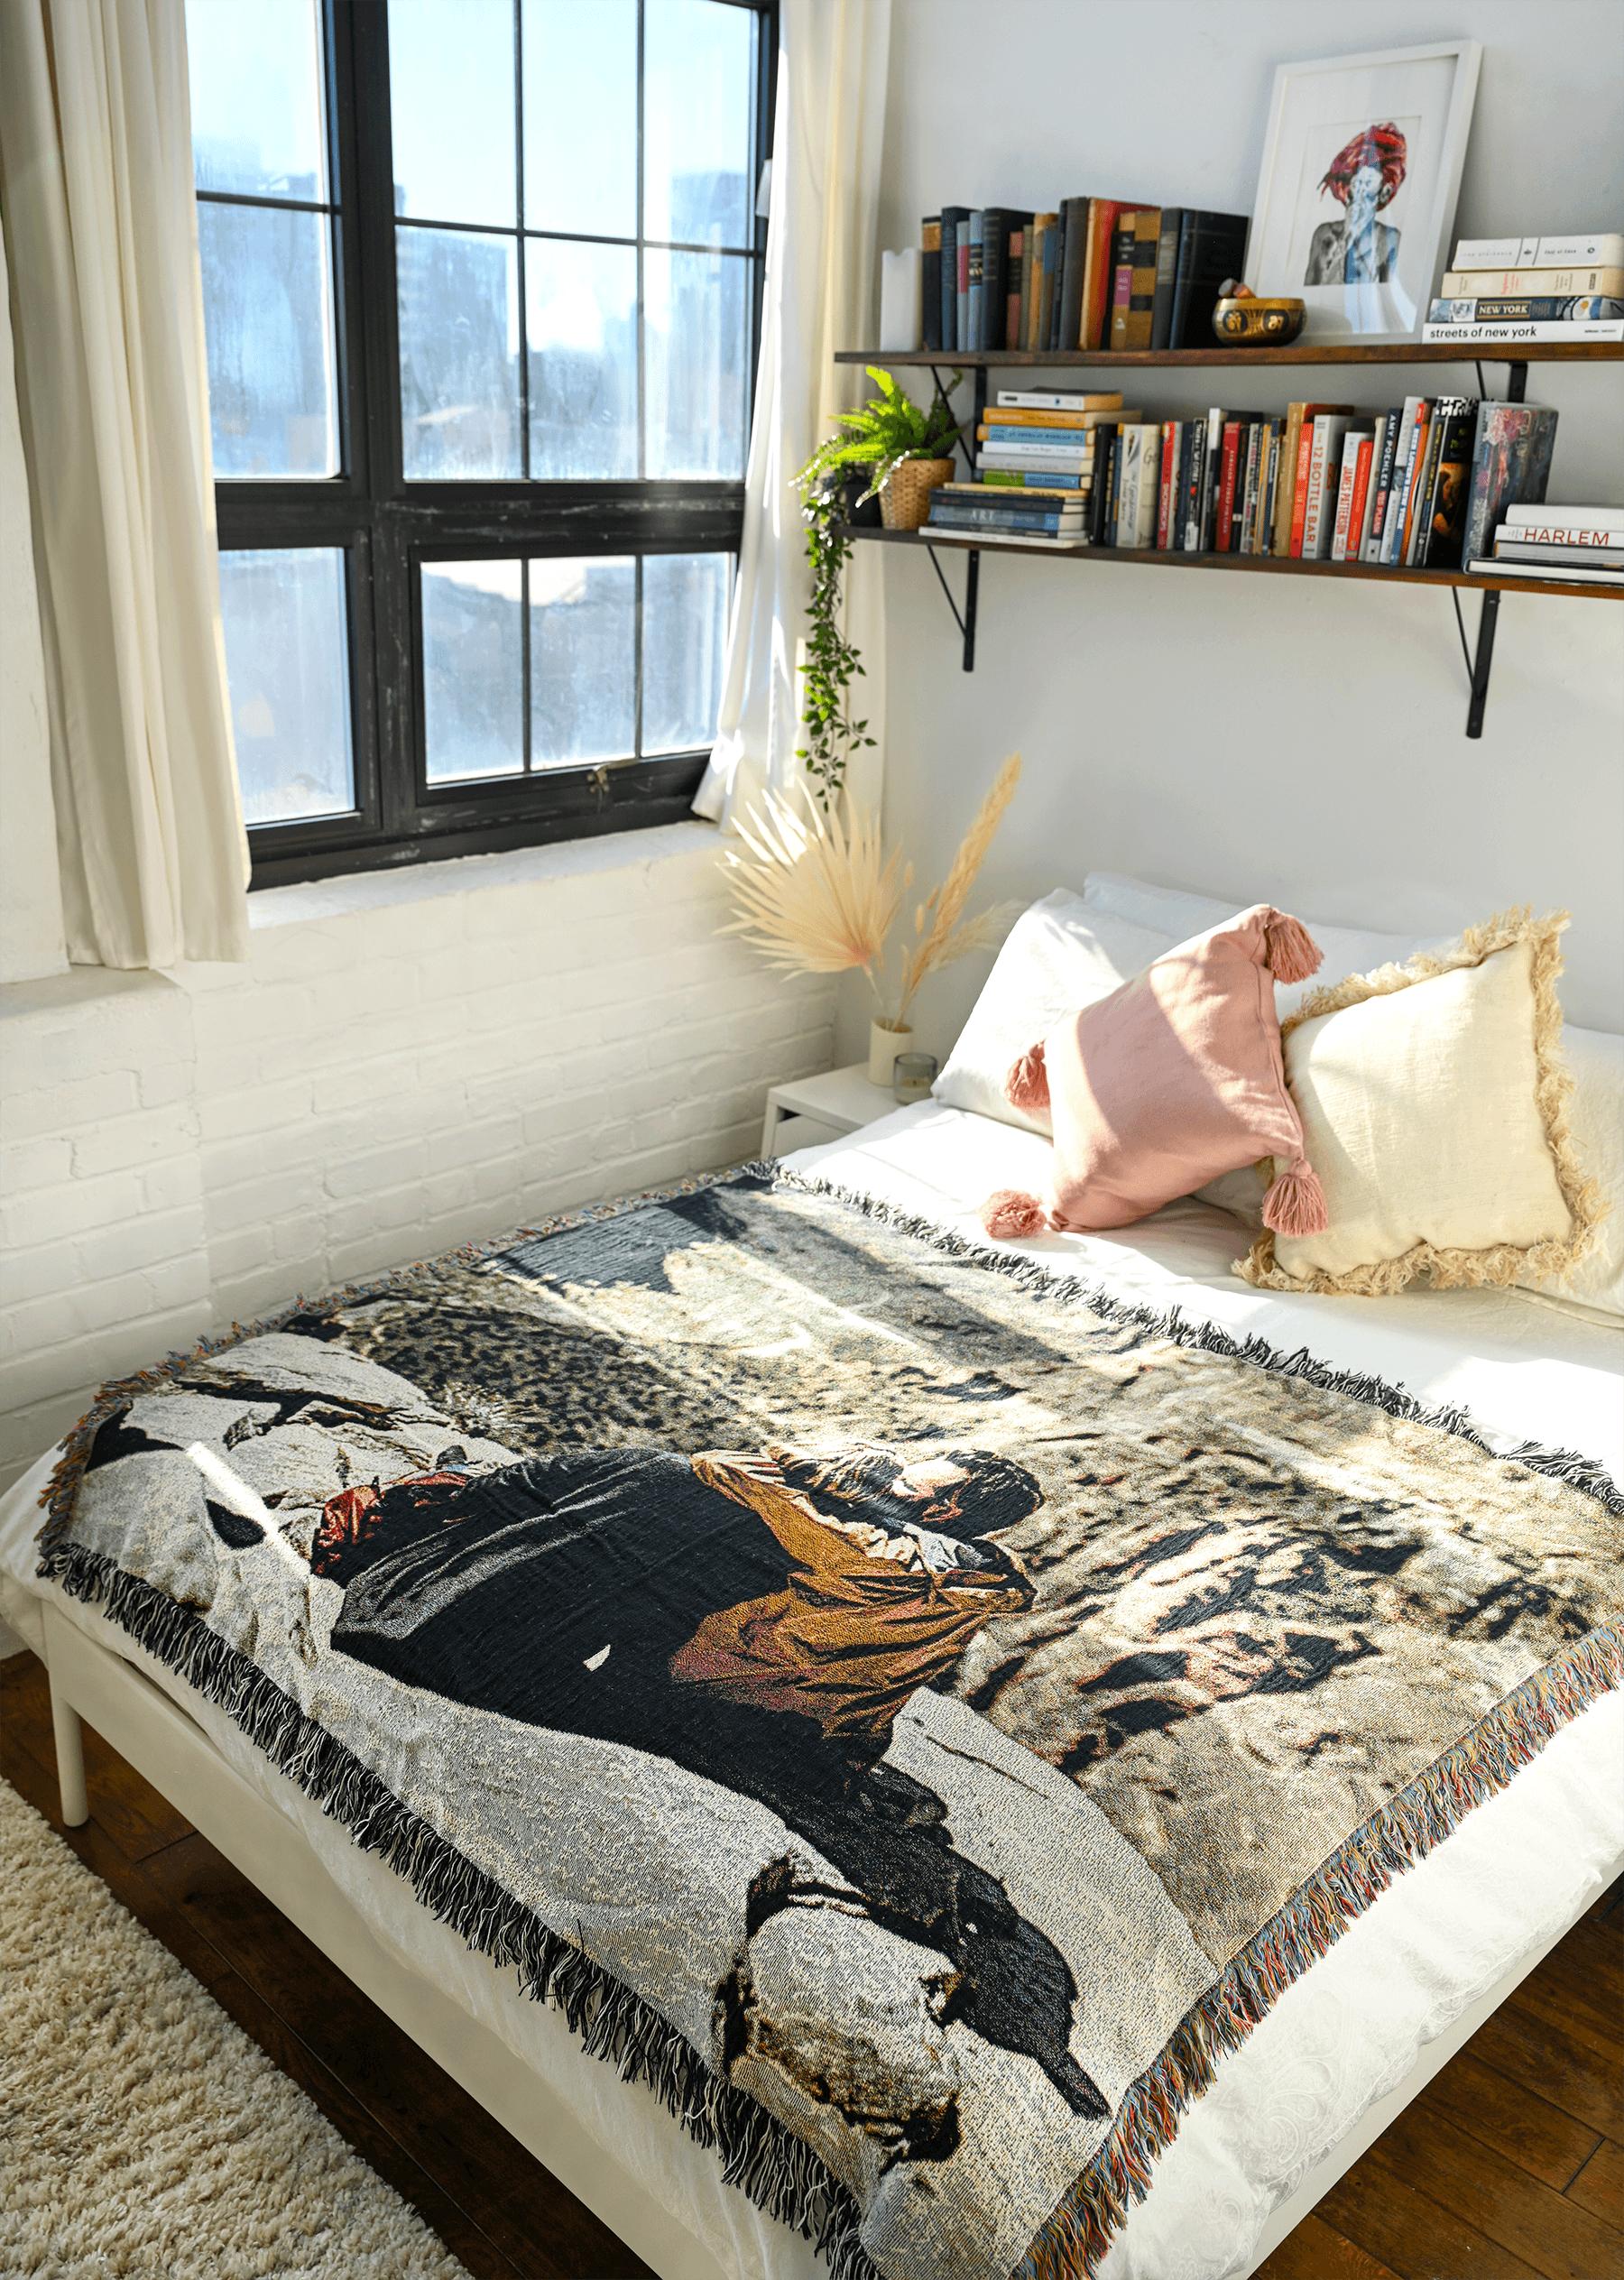 Make a custom photo blanket for Valentine's Day